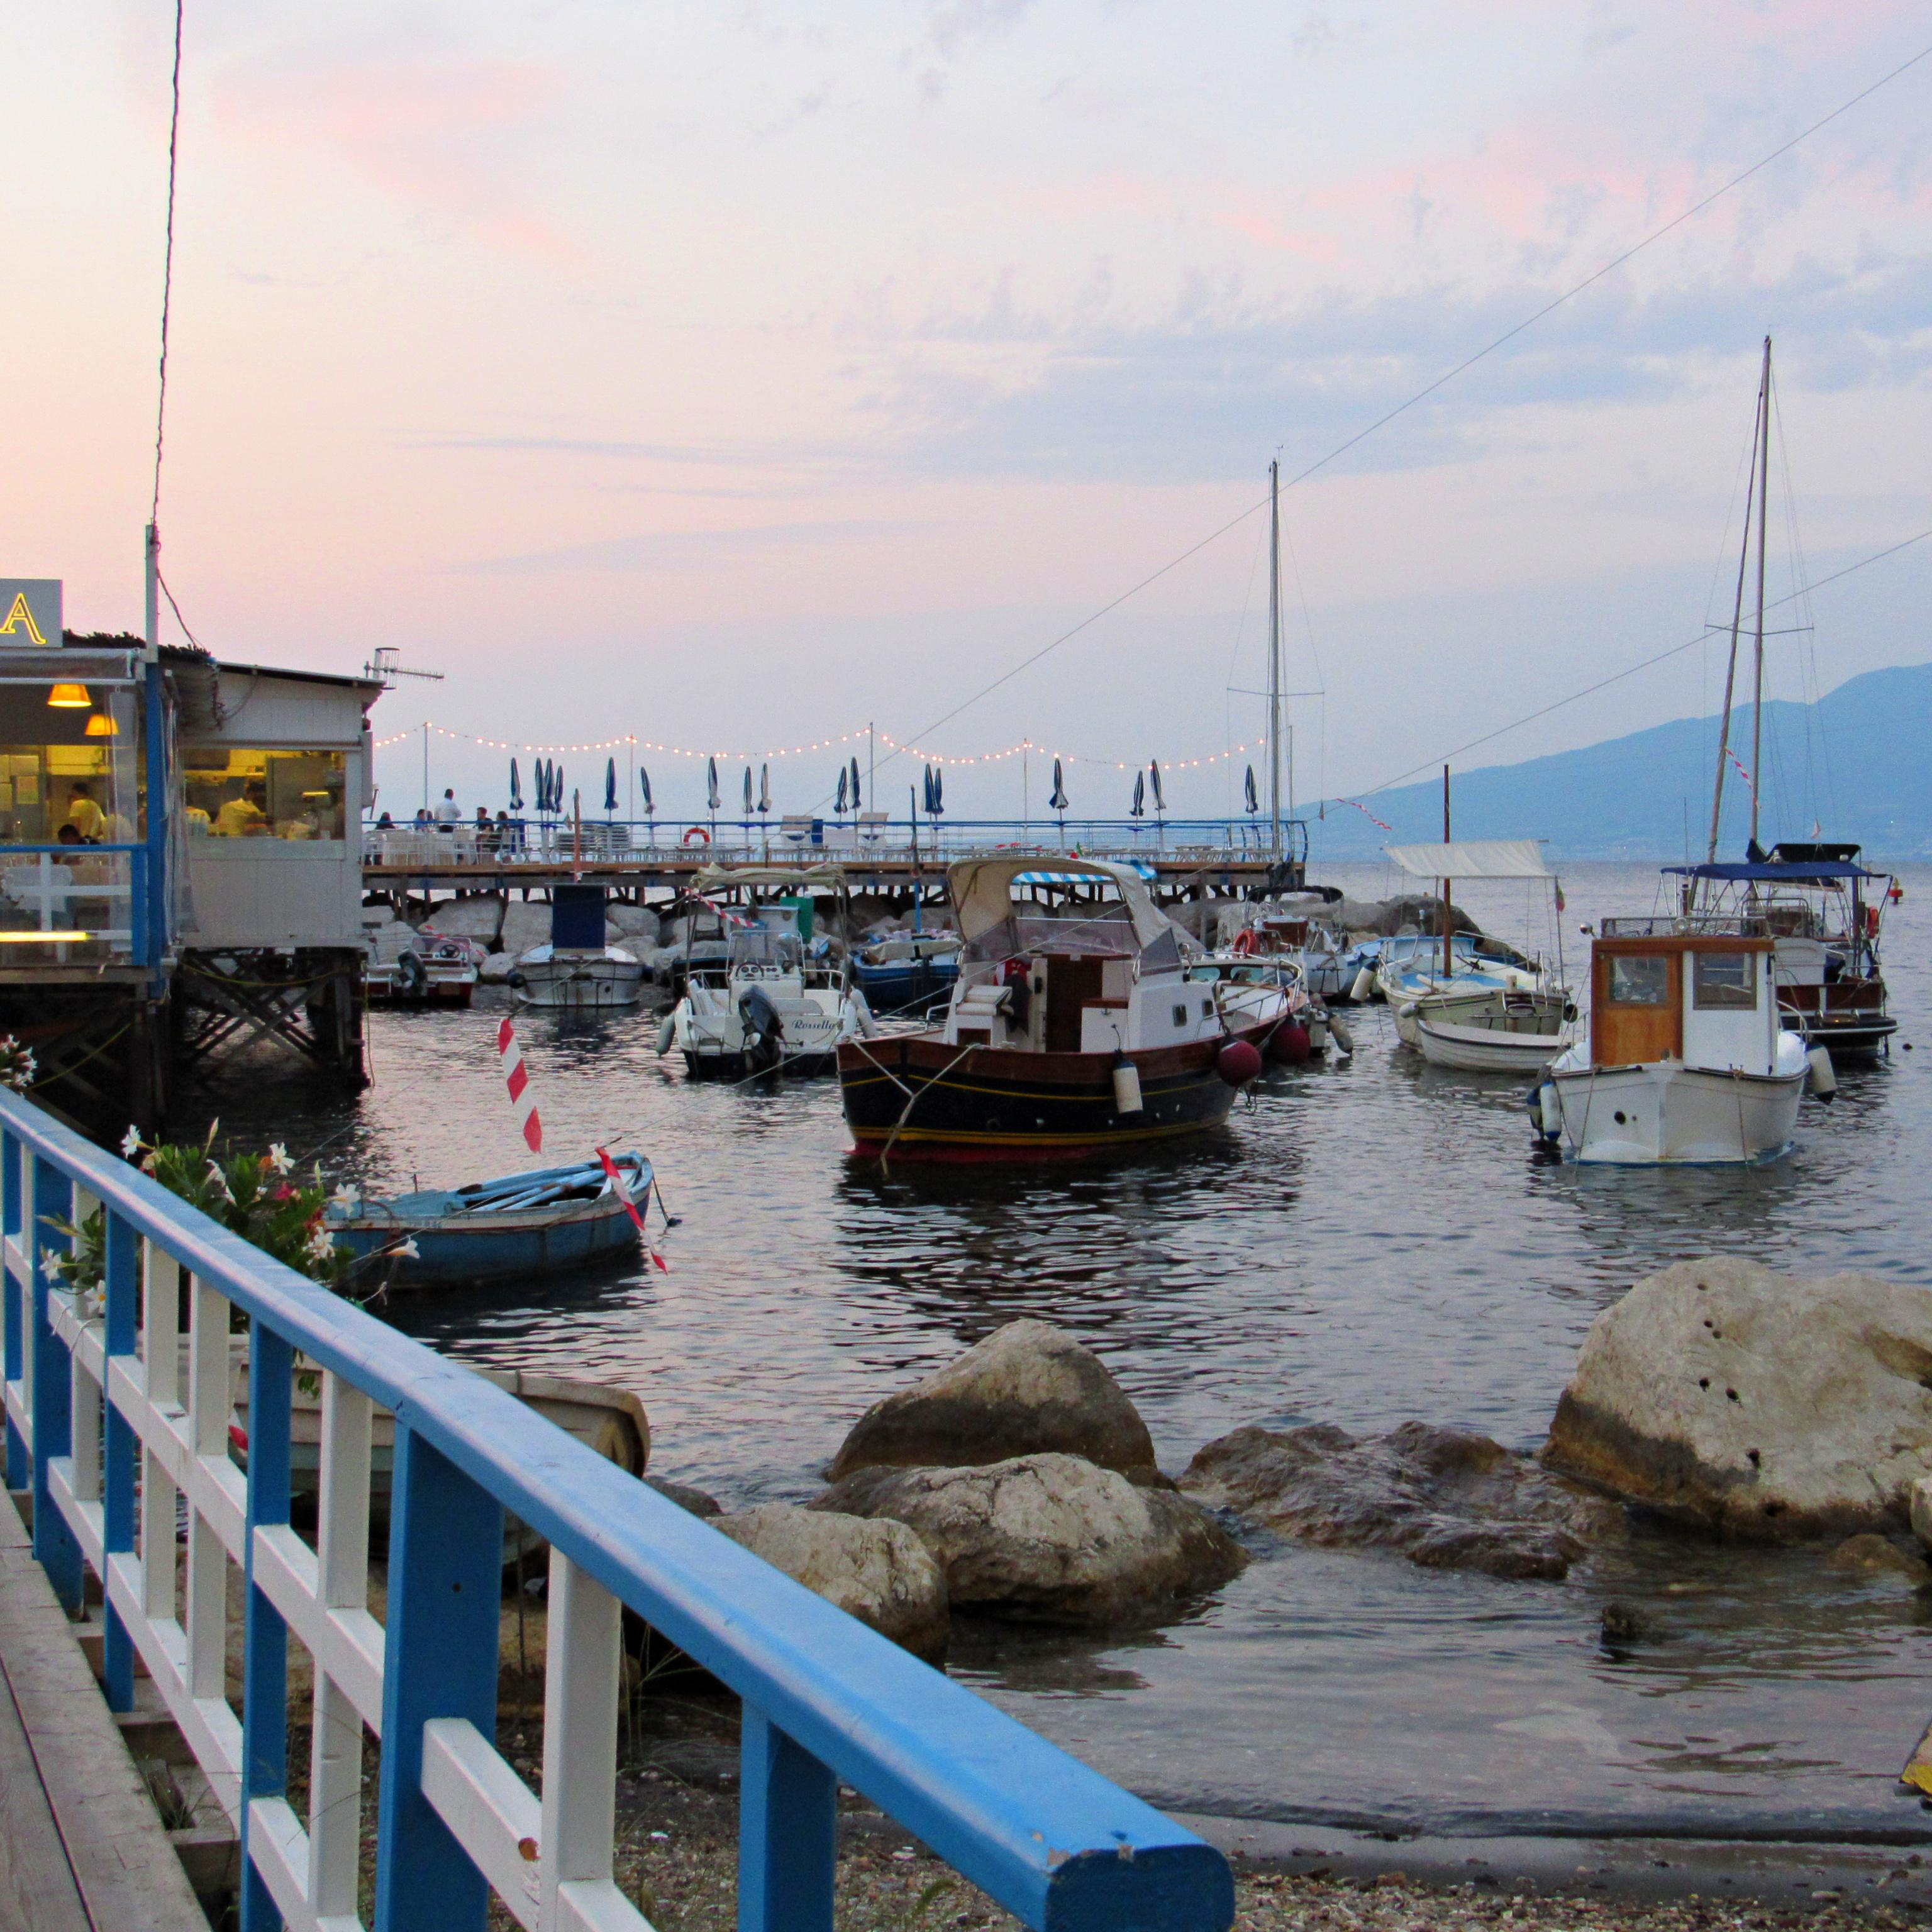 Festival of Marina Grande 2